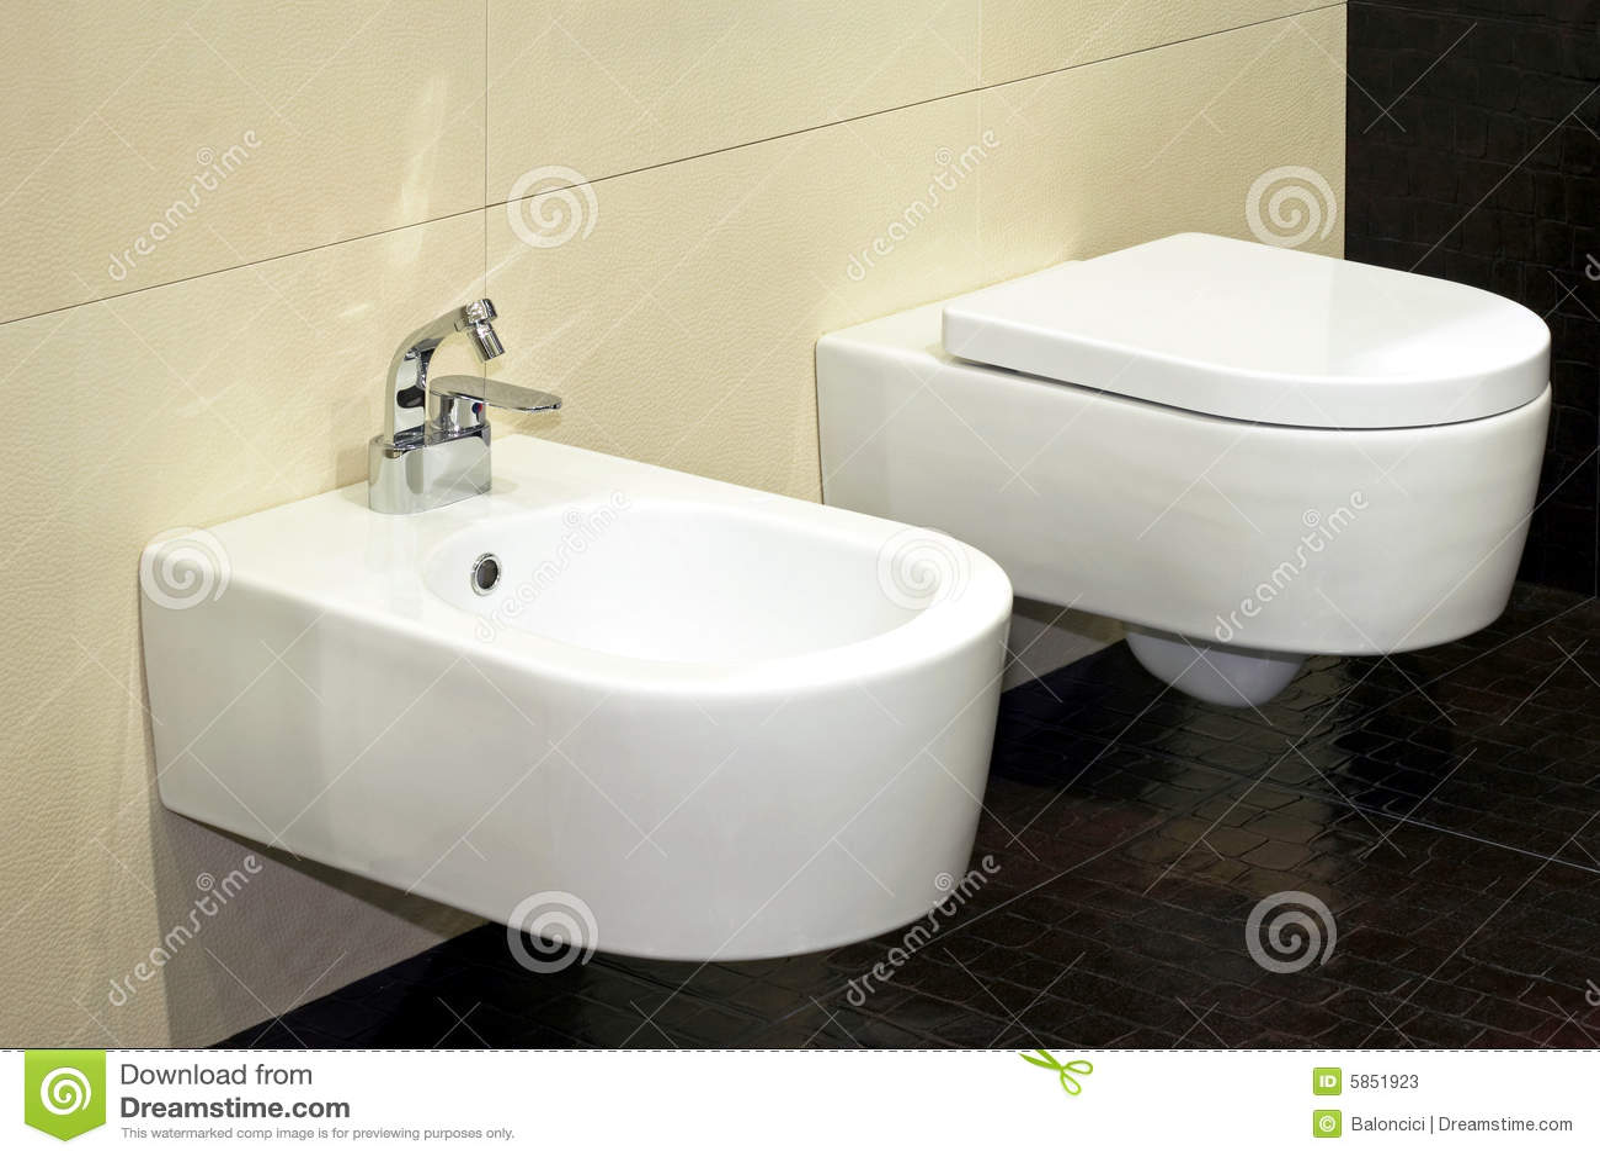 Toilette de bidet